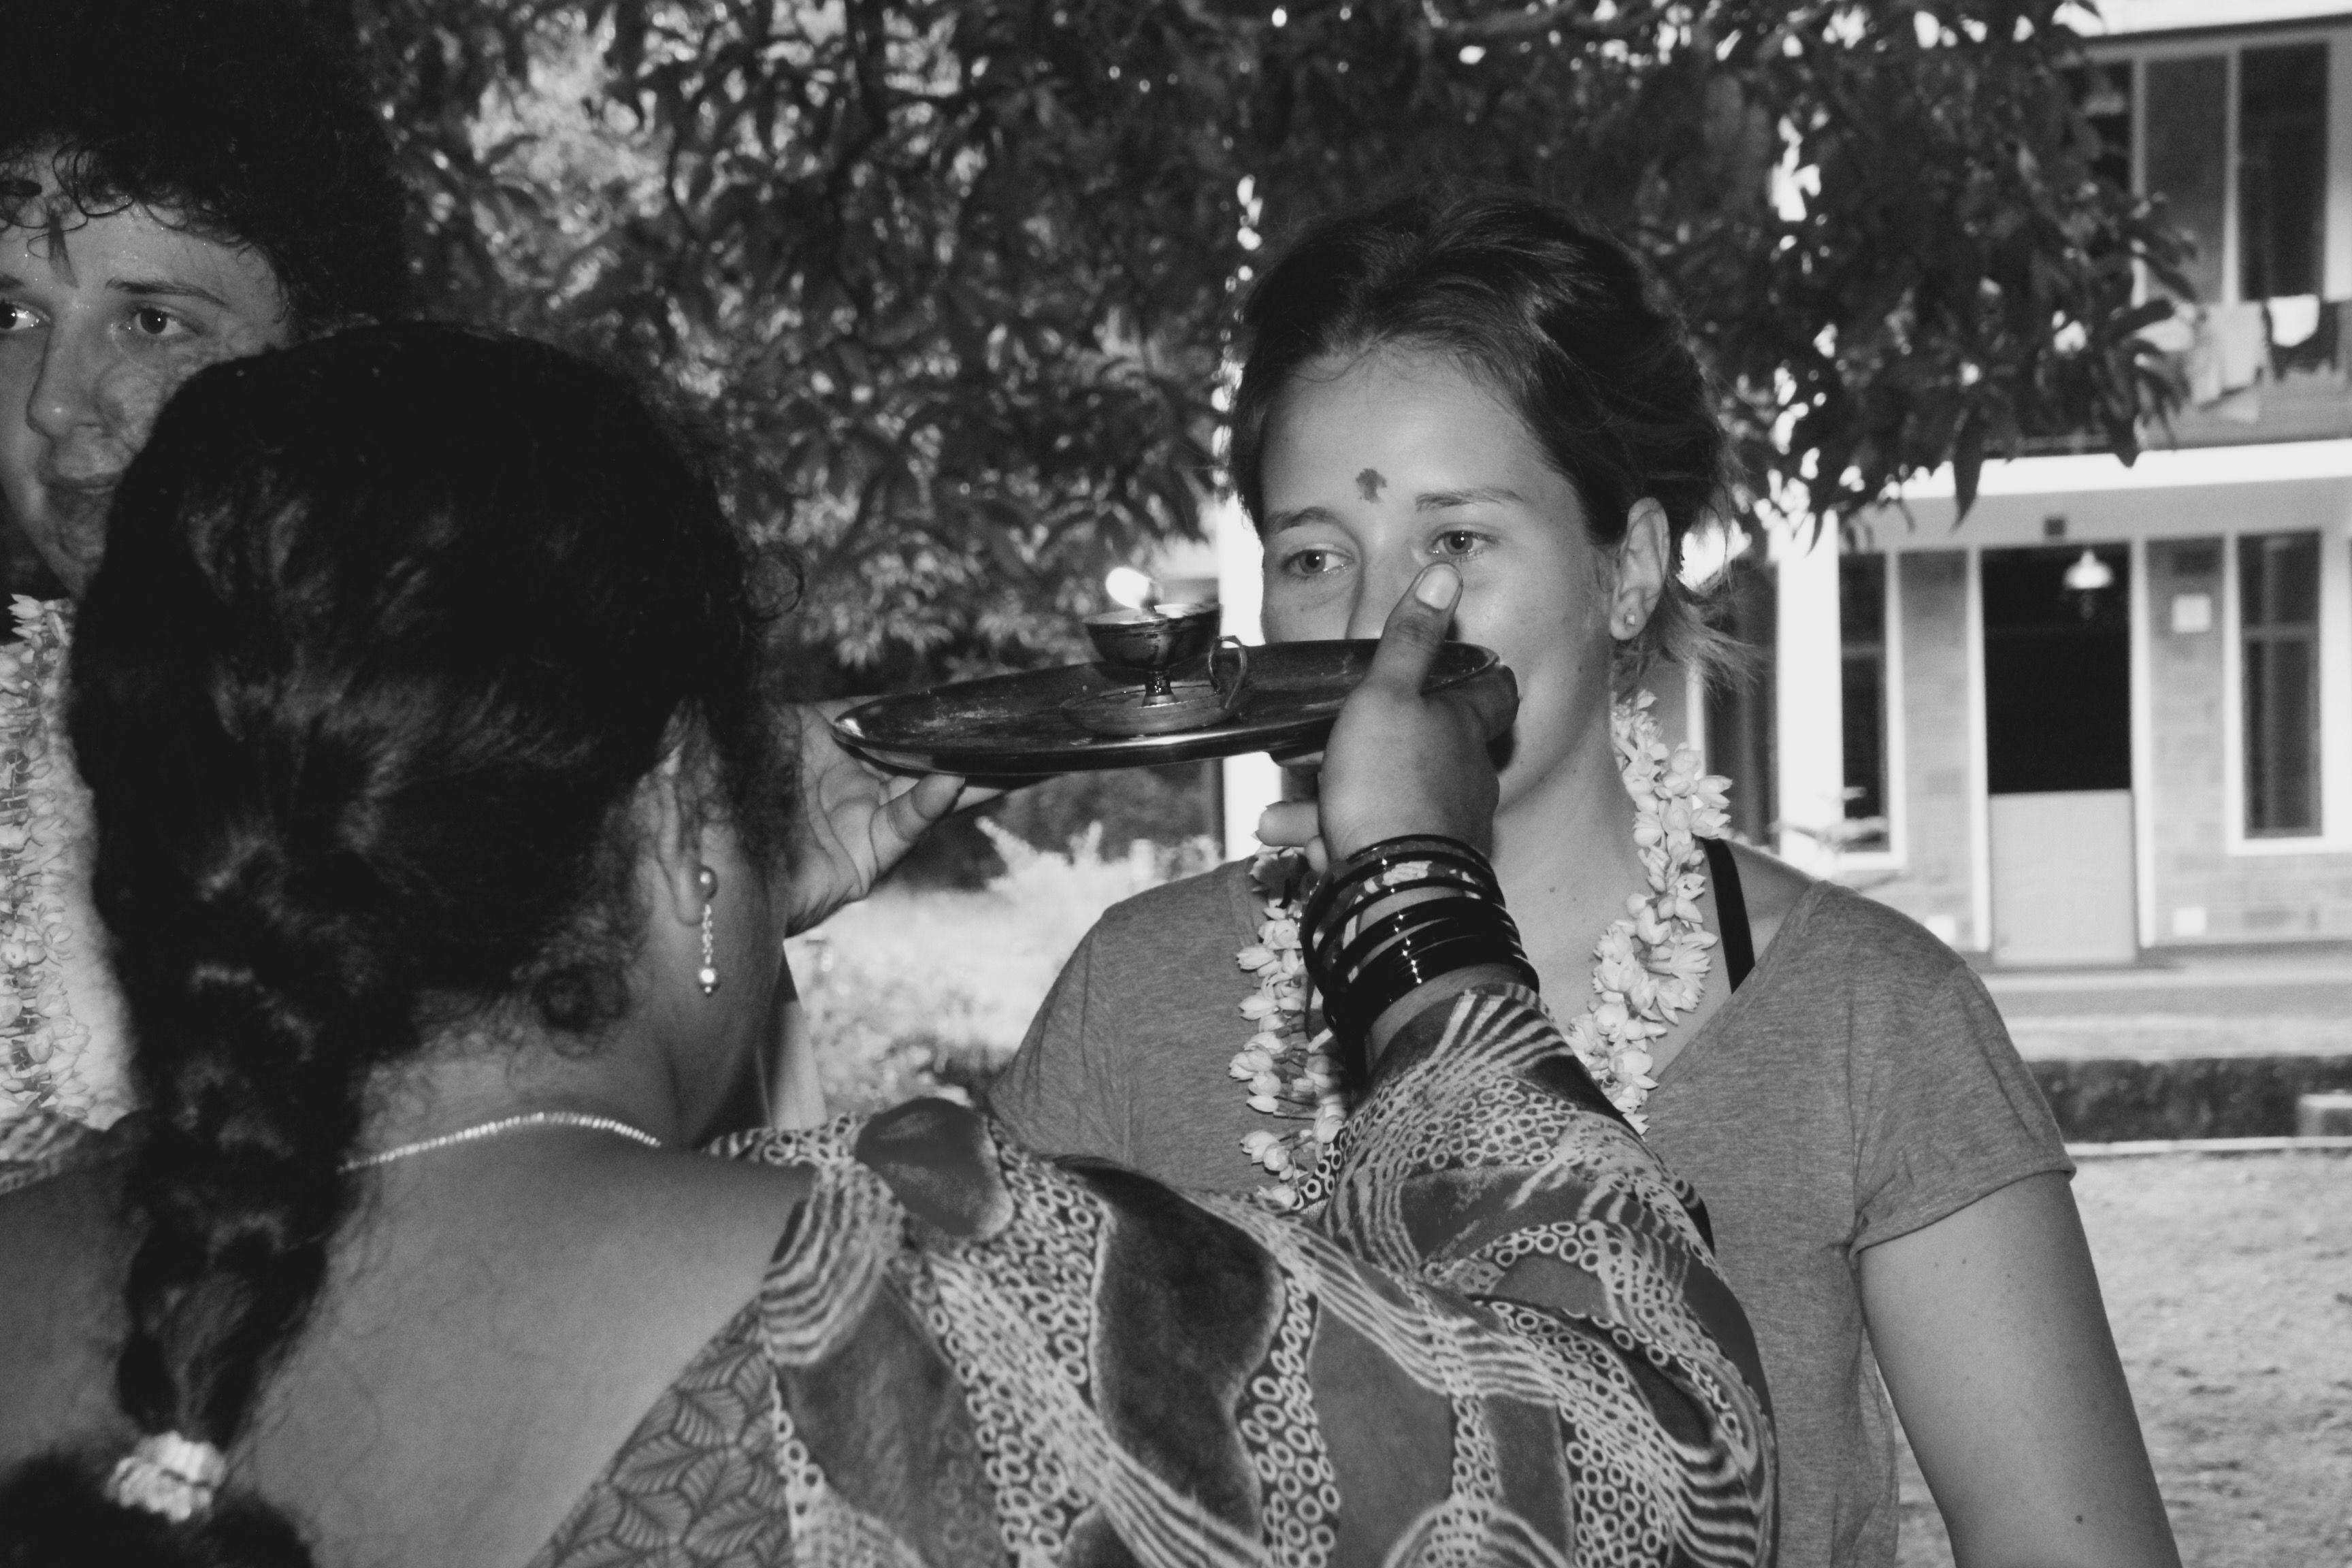 Welcome to India and my blog #pondicherry #womenempowerment #volunteerservice #travel #food #adventure verenagoestoindia